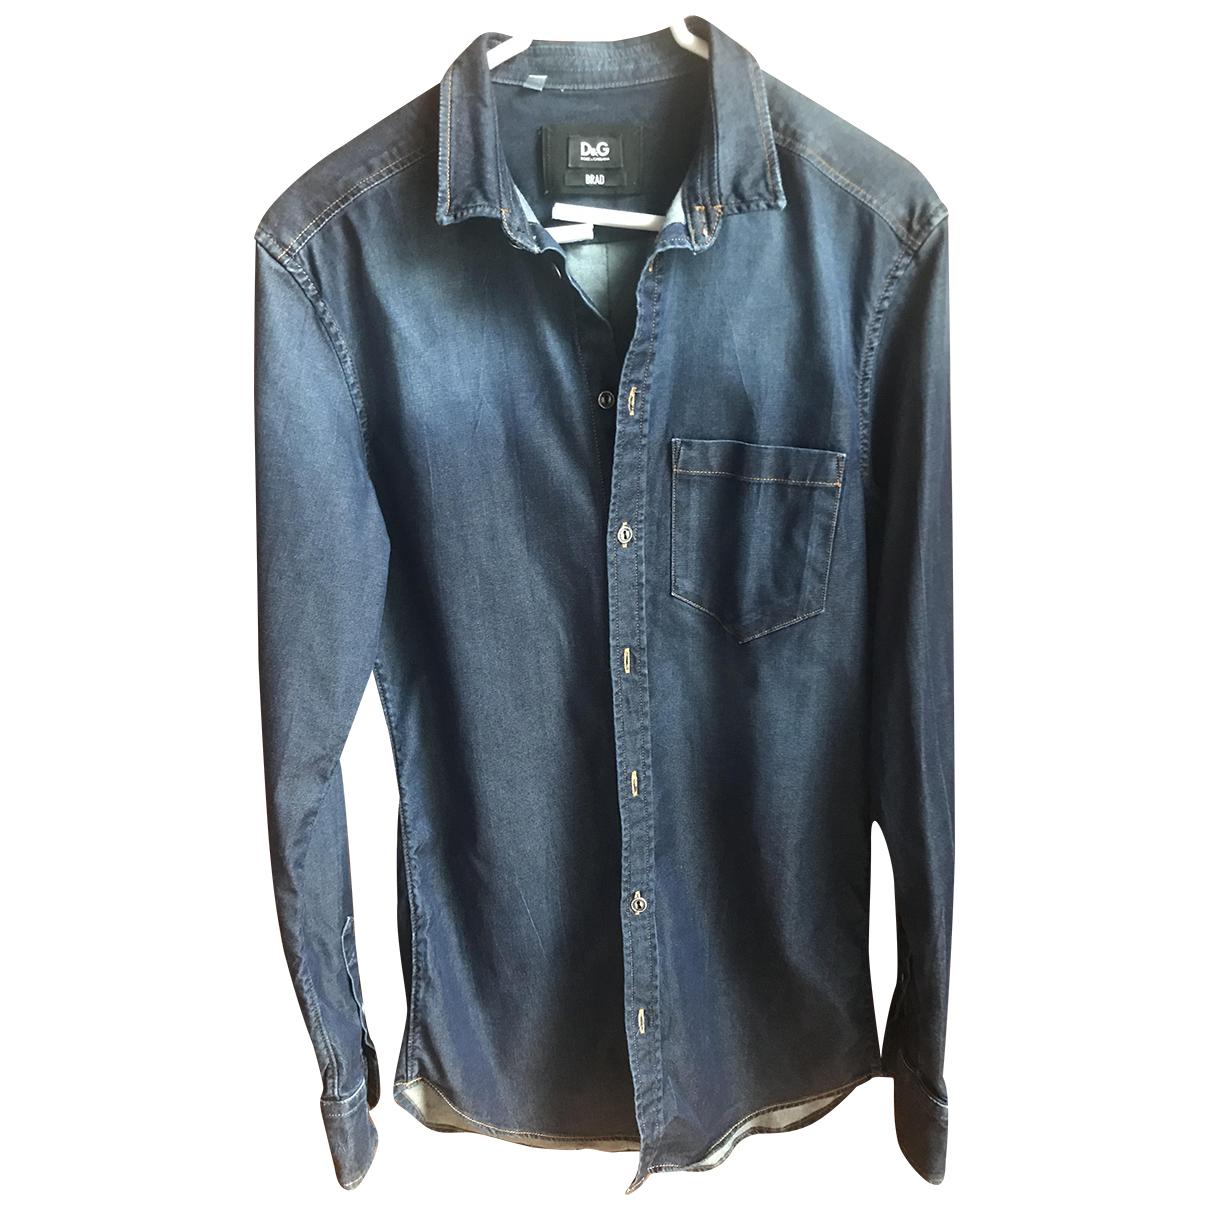 D&g N Denim - Jeans Shirts for Men 37 EU (tour de cou / collar)